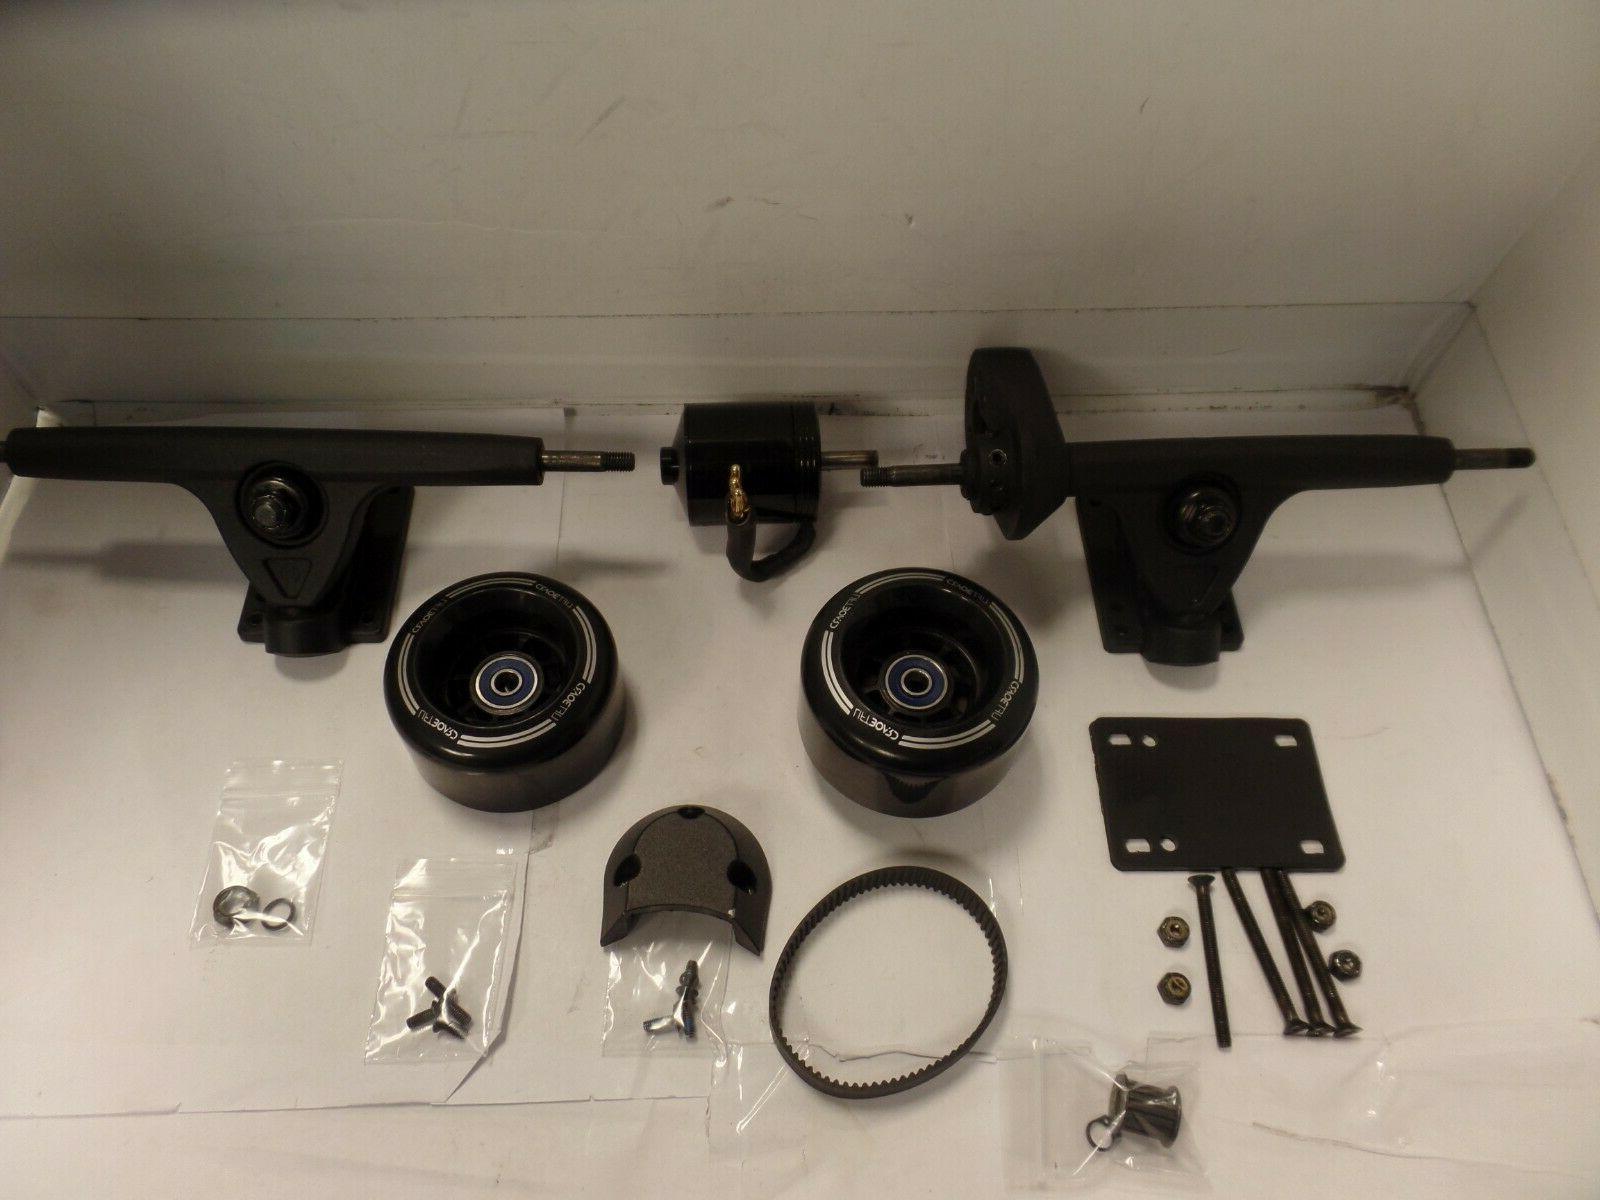 Genuine LIFTBOARD Electric OEM Wheel/Gear/Trucks/Axel/Screw/etc